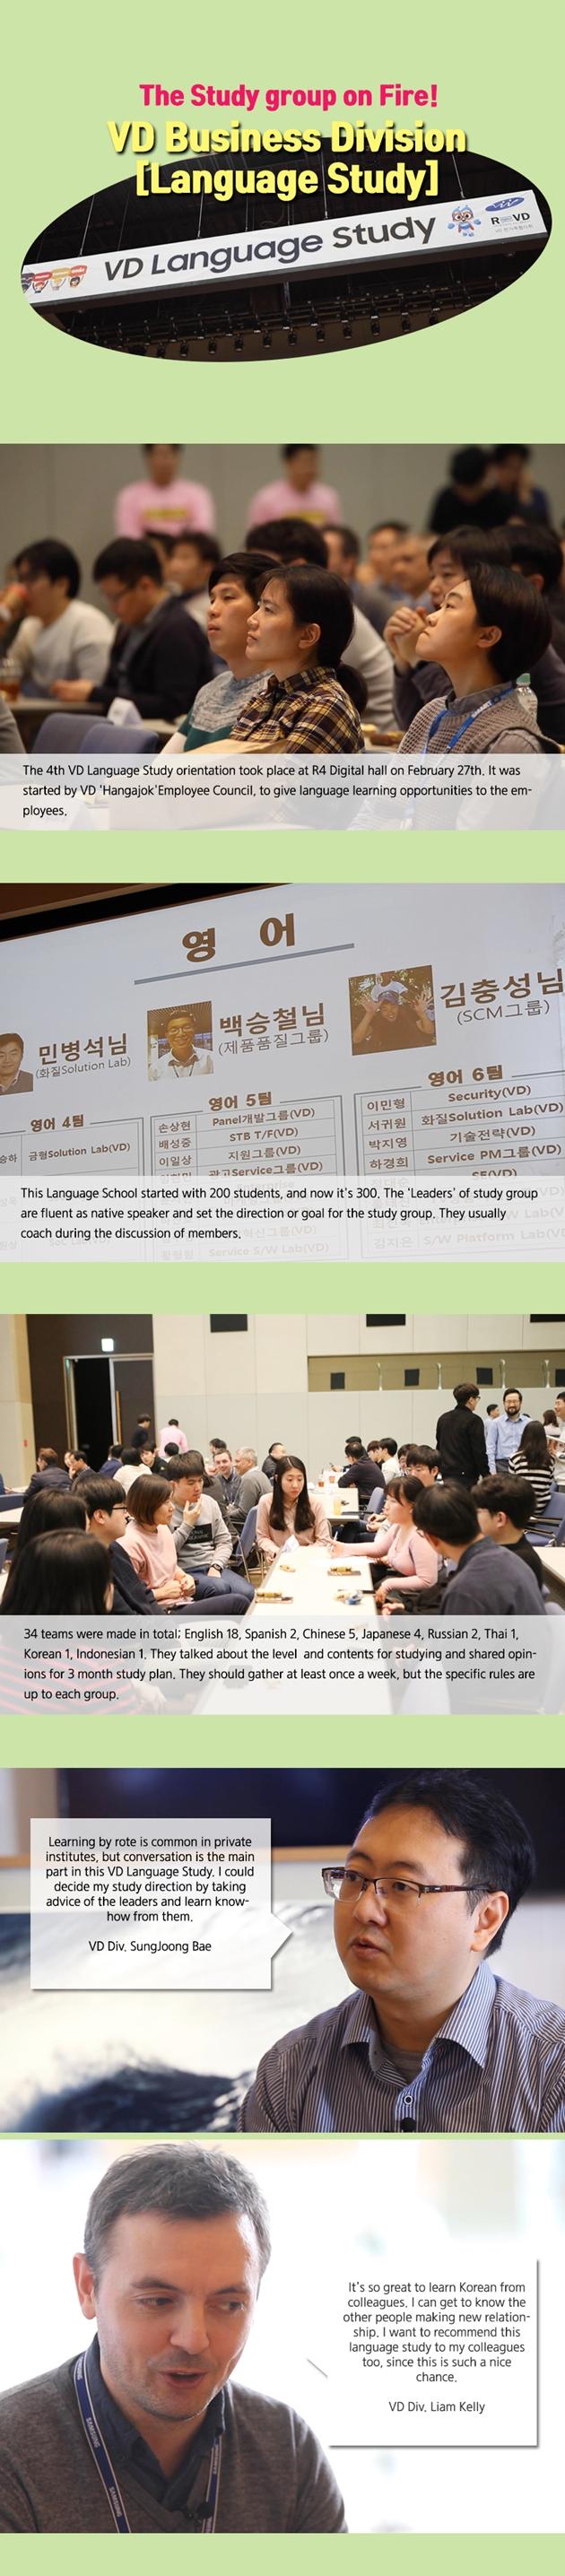 open square, Samsung Digitalcity, Samsung Newsletter, Samsung News